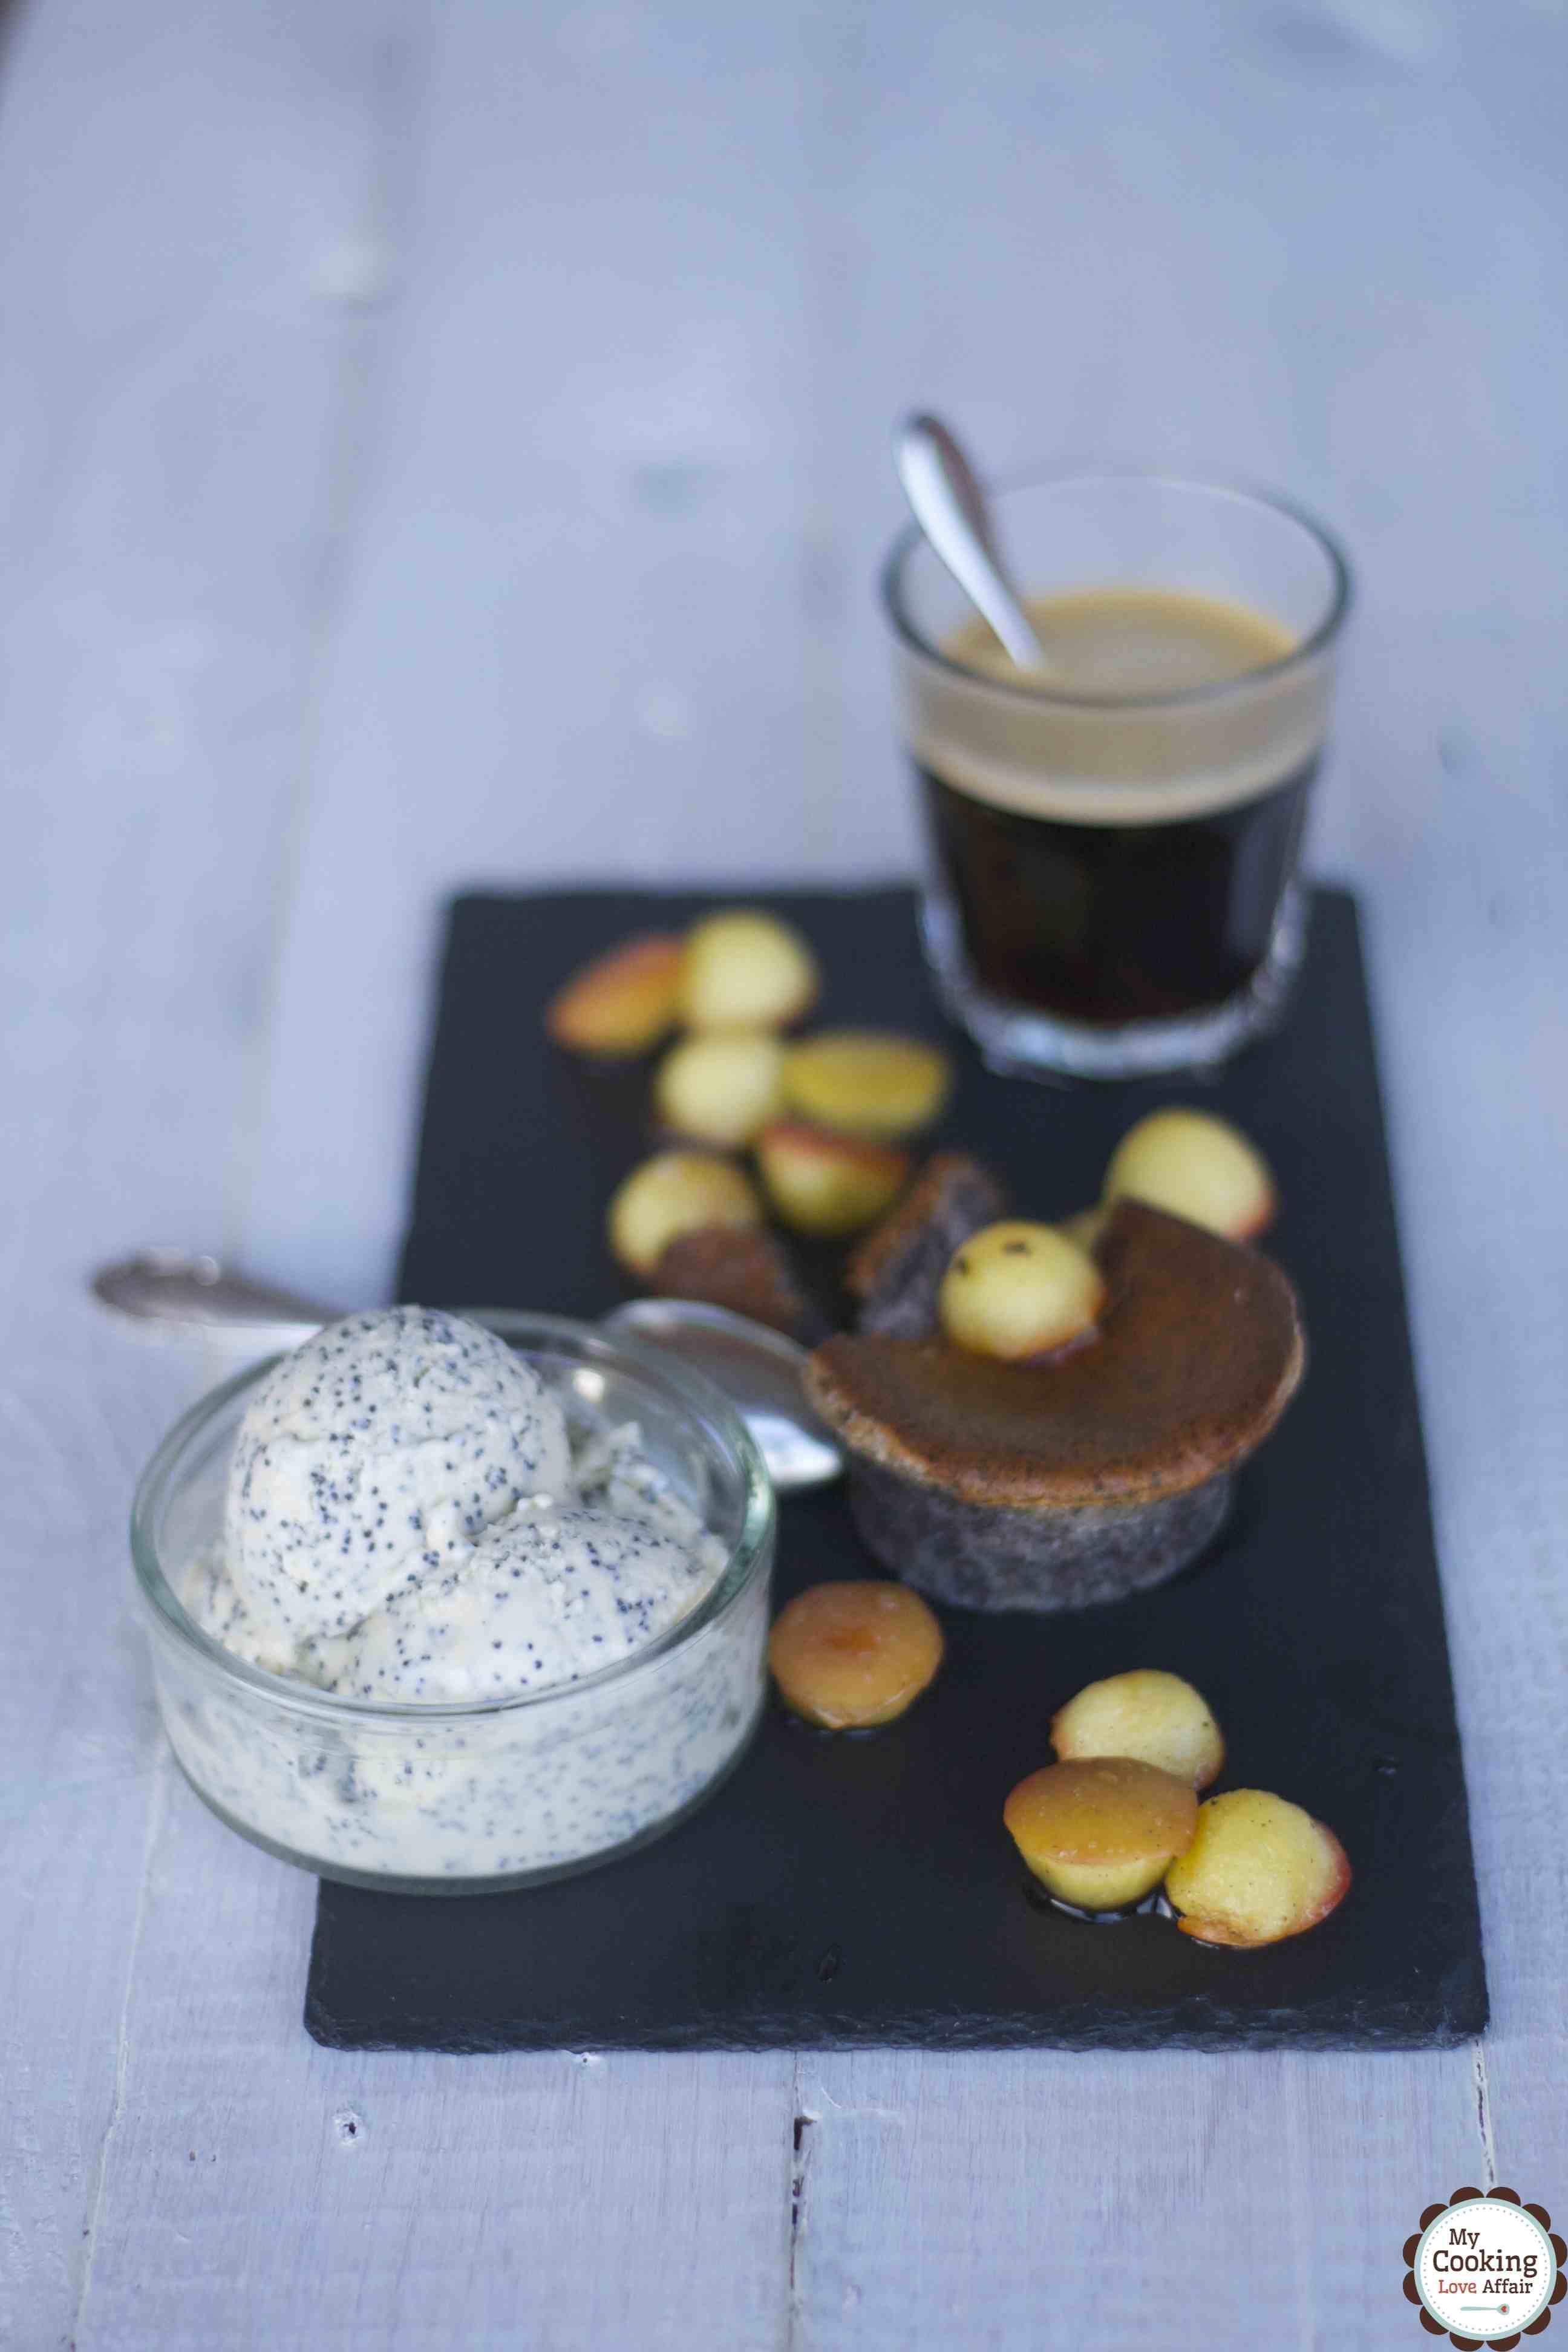 Rotweinsoufflé mit Mohnglace und Calvados-Apfel